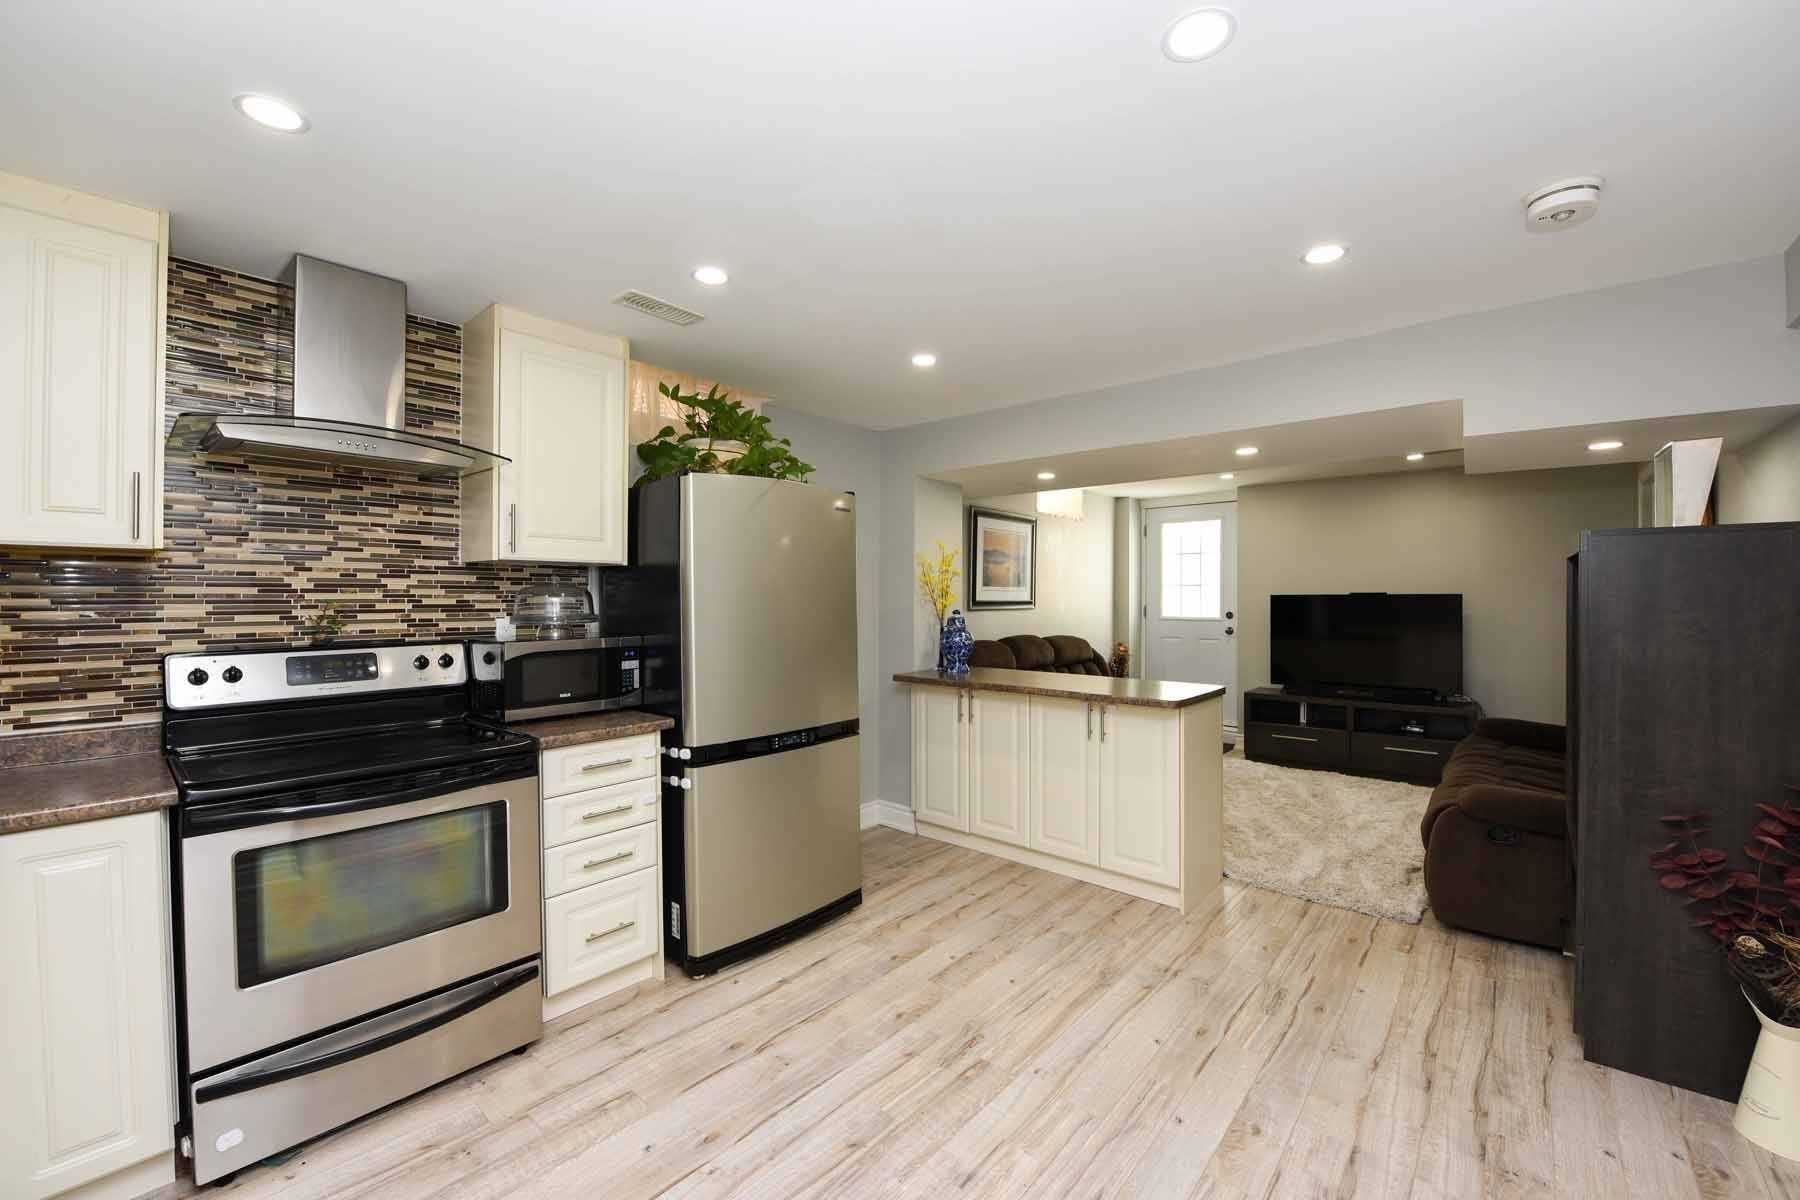 Photo 2: Photos: 20 Hallen Road in Brampton: Fletcher's West House (Apartment) for lease : MLS®# W5074220